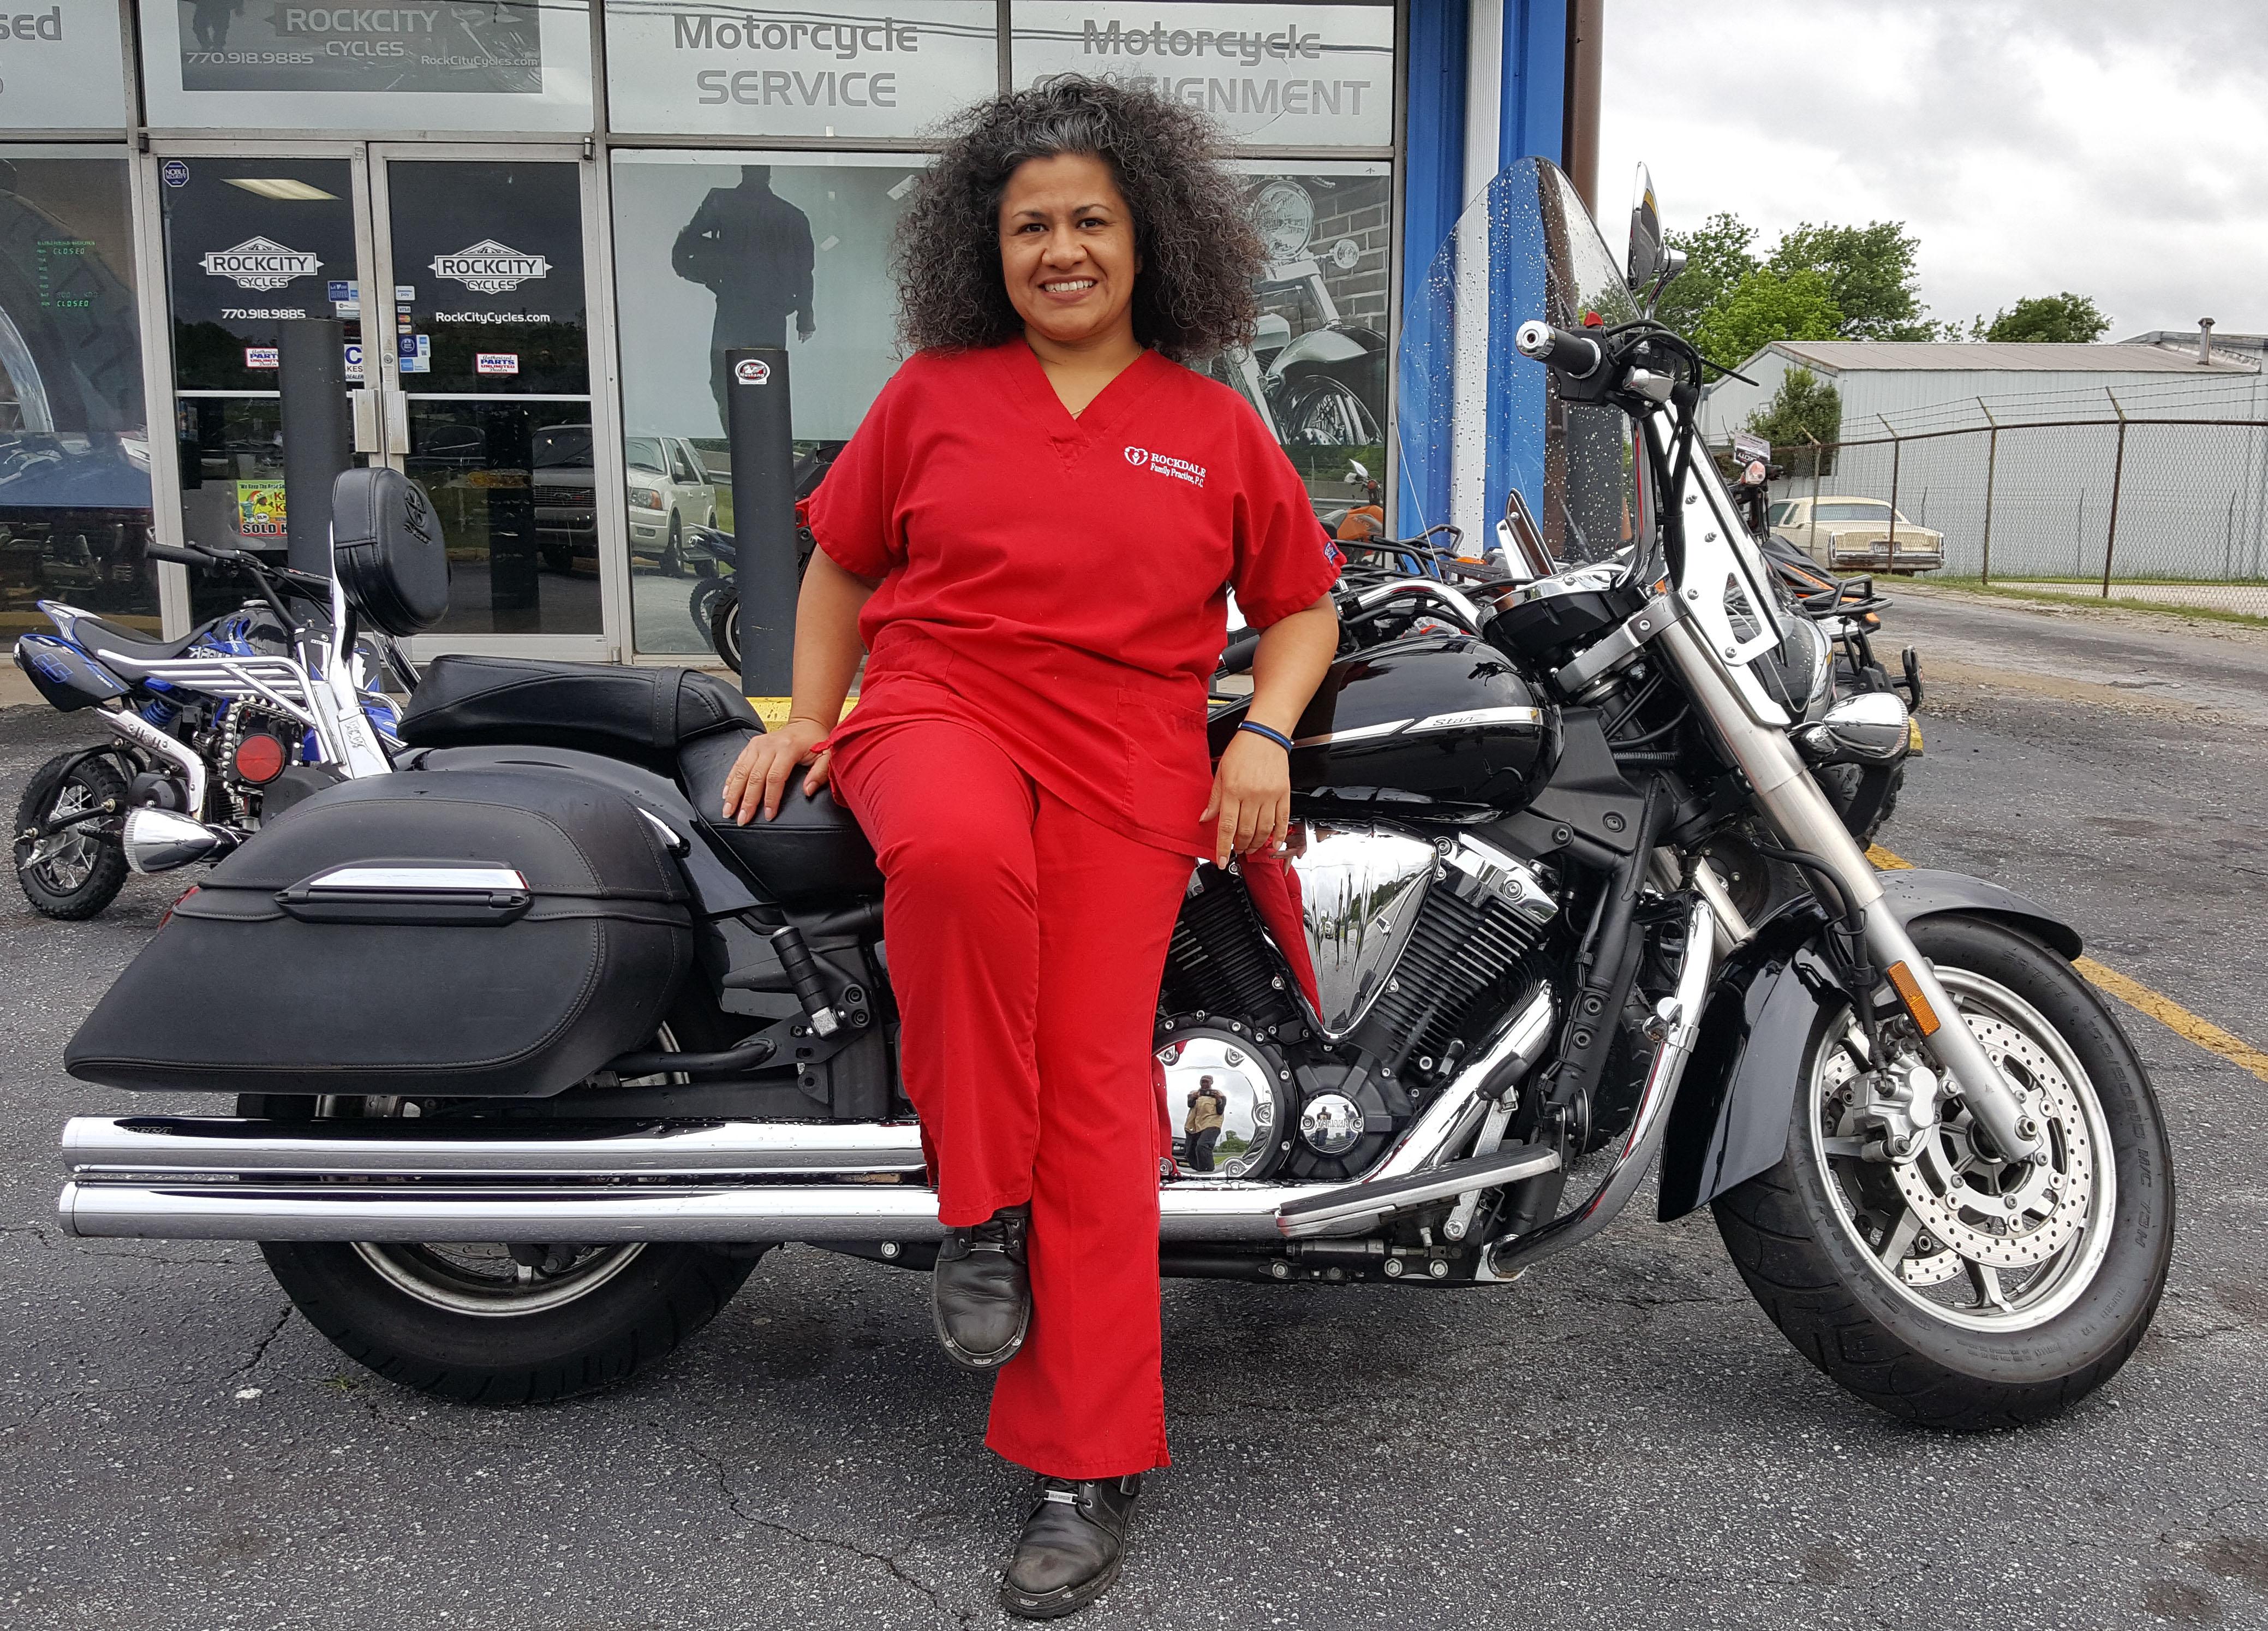 Tonya F. with her 2007 Yamaha XVS1300